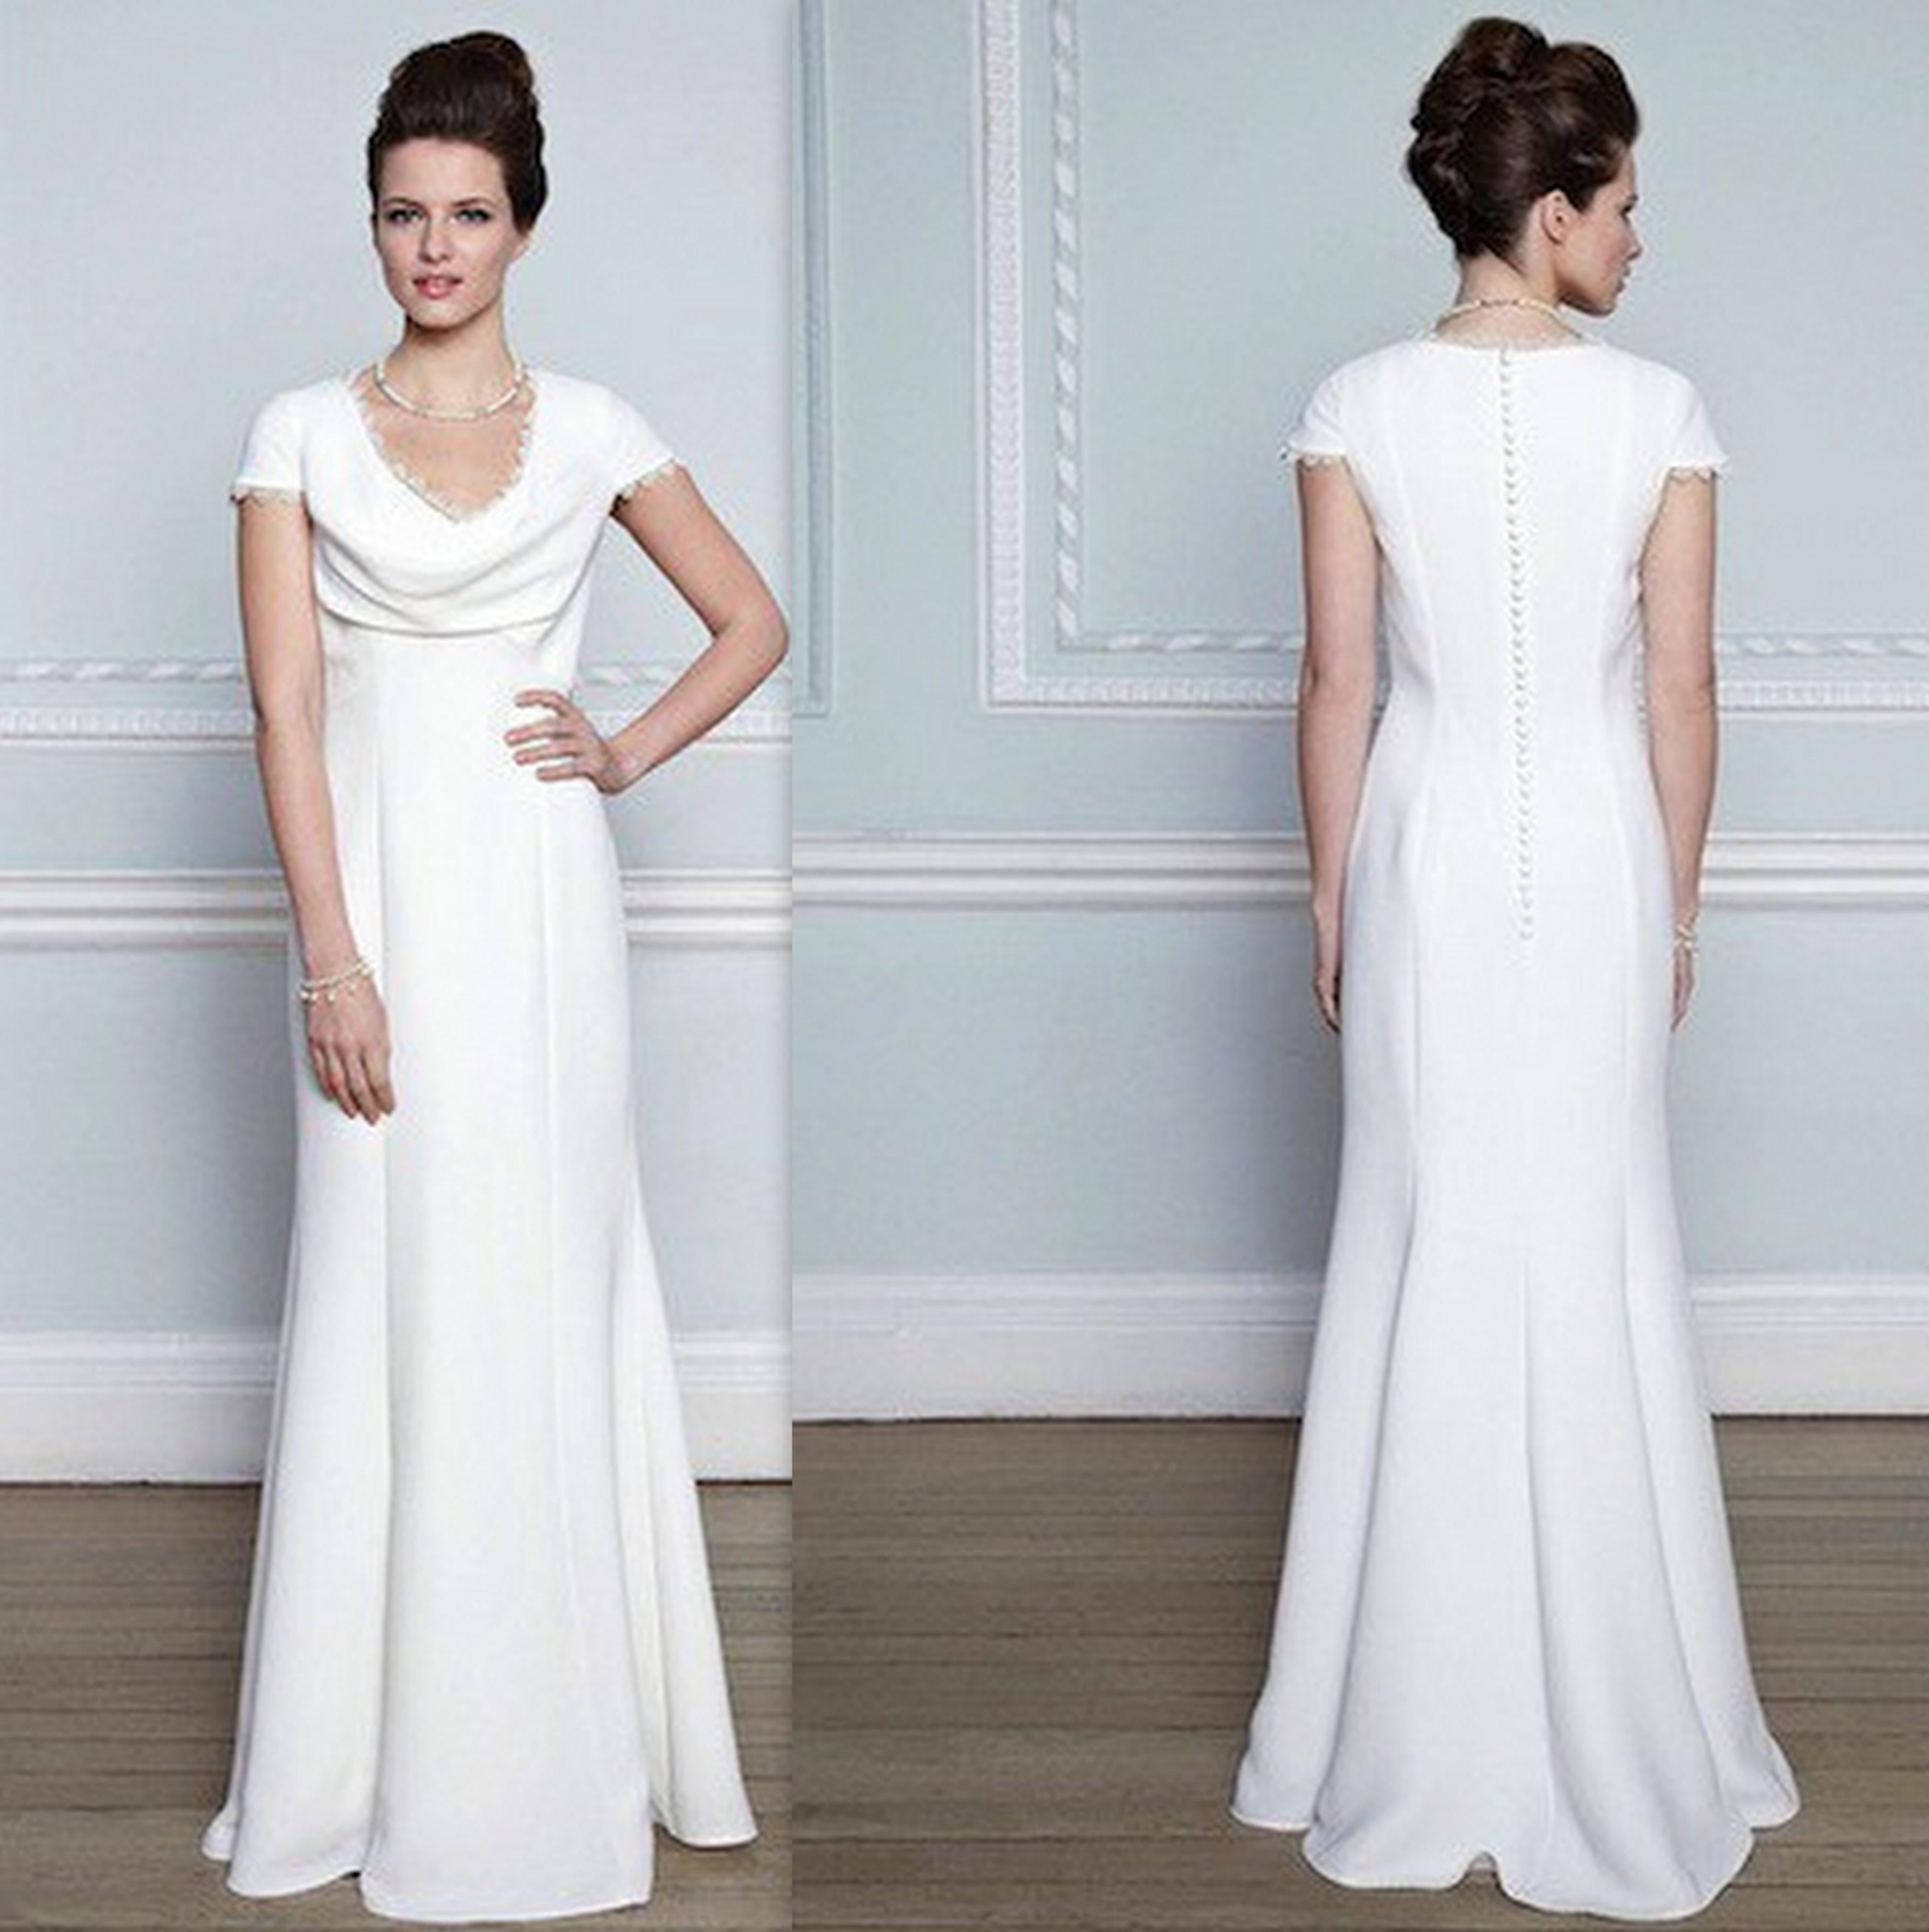 plus size wedding dresses for beach wedding photo - 1